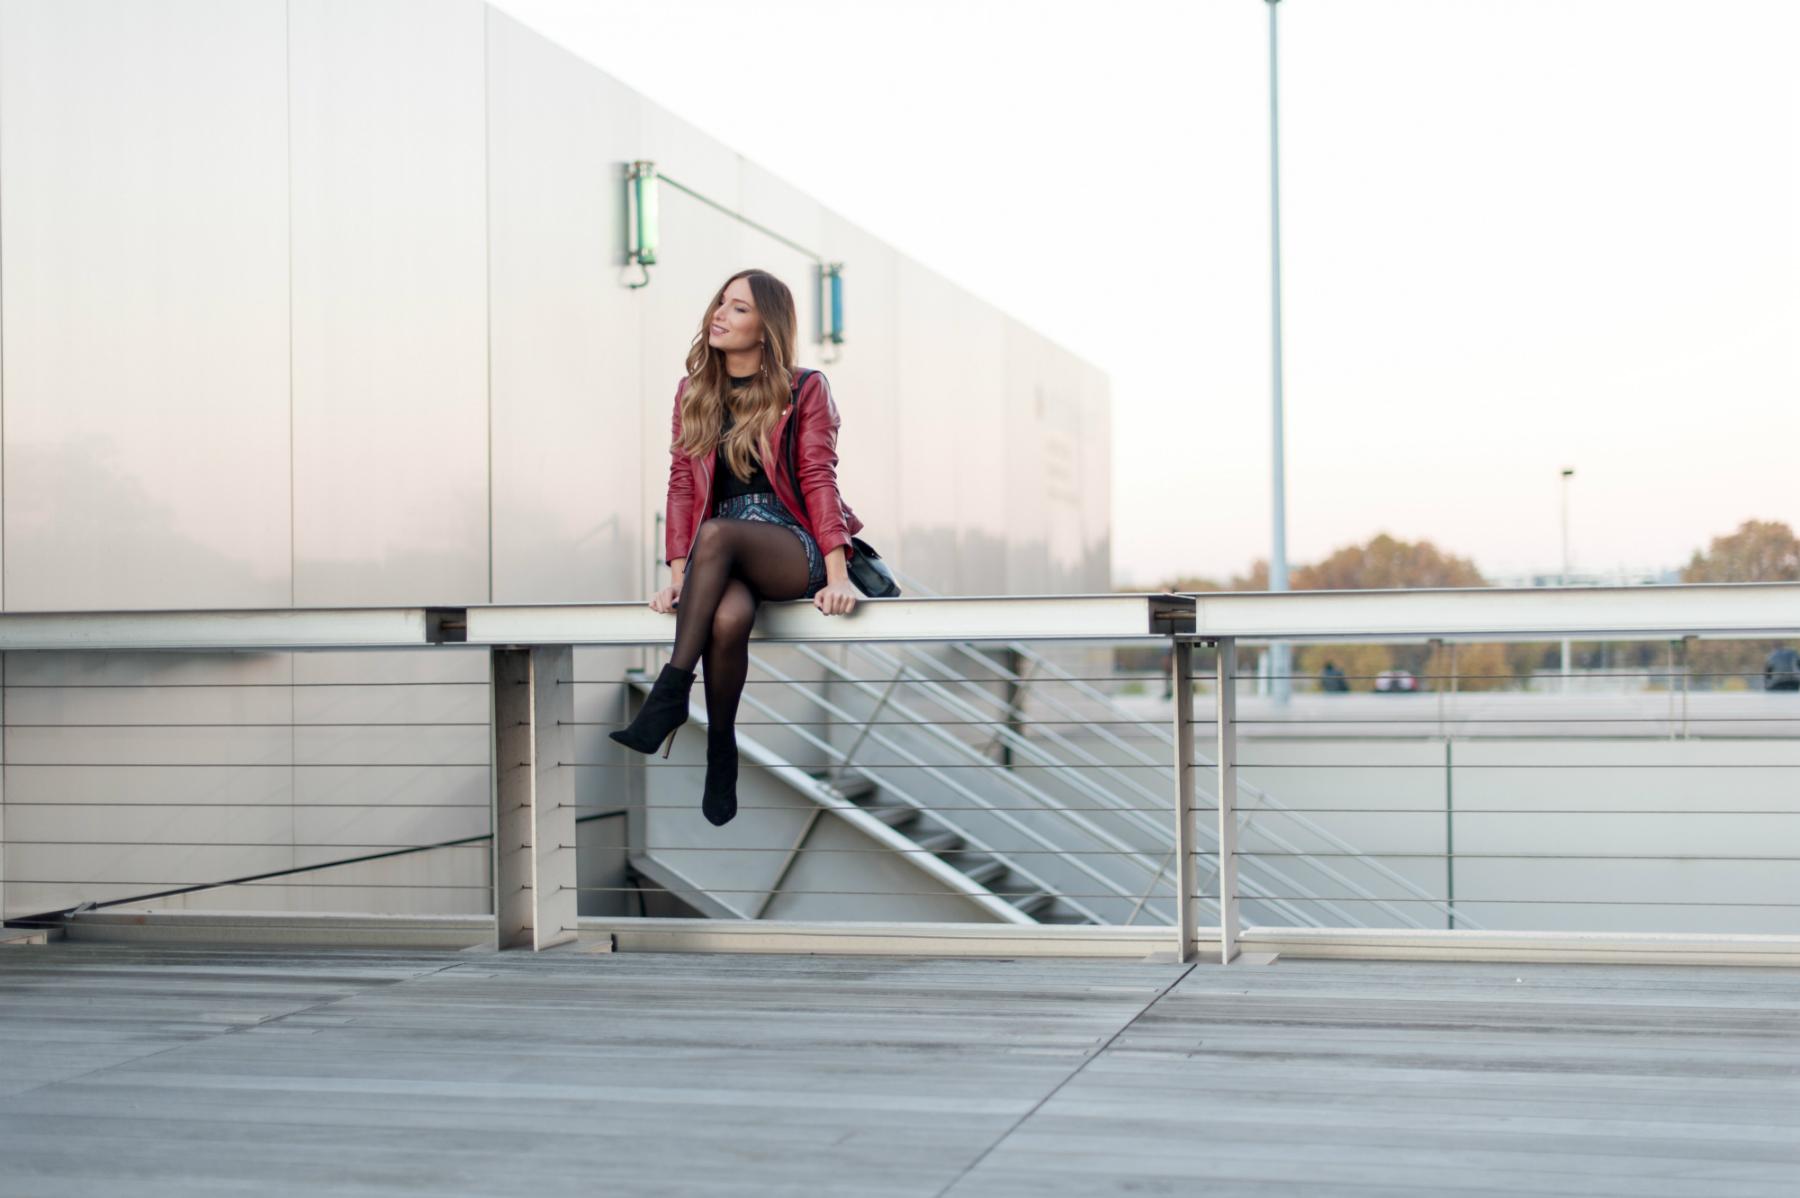 blog mode lifestyle paris bnf